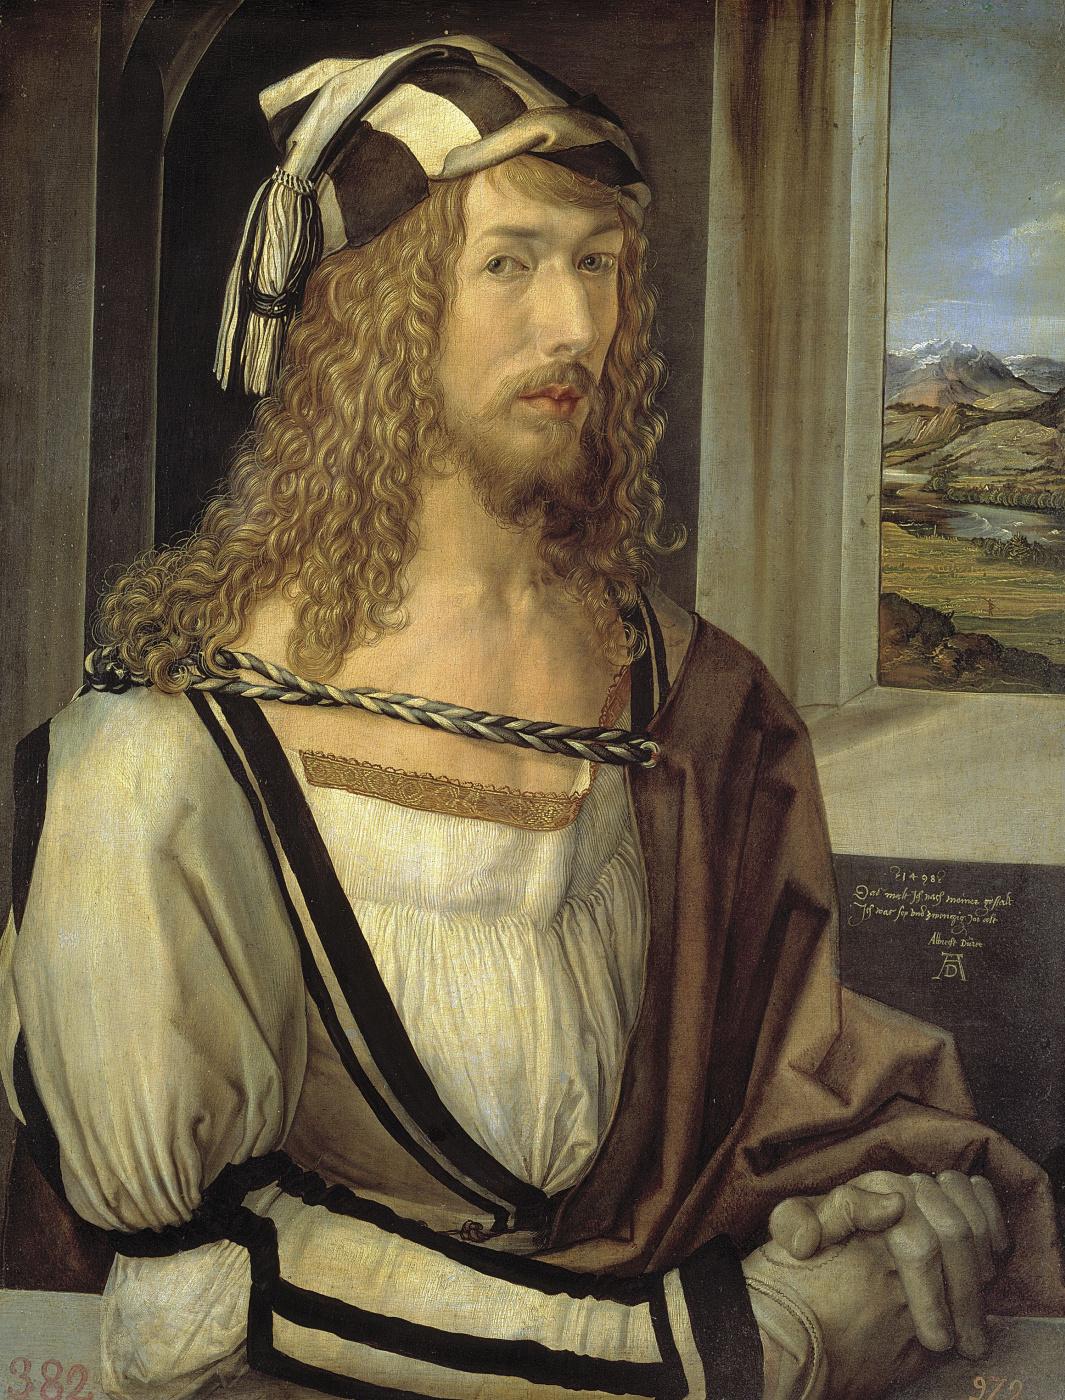 Albrecht Durer. Self-portrait